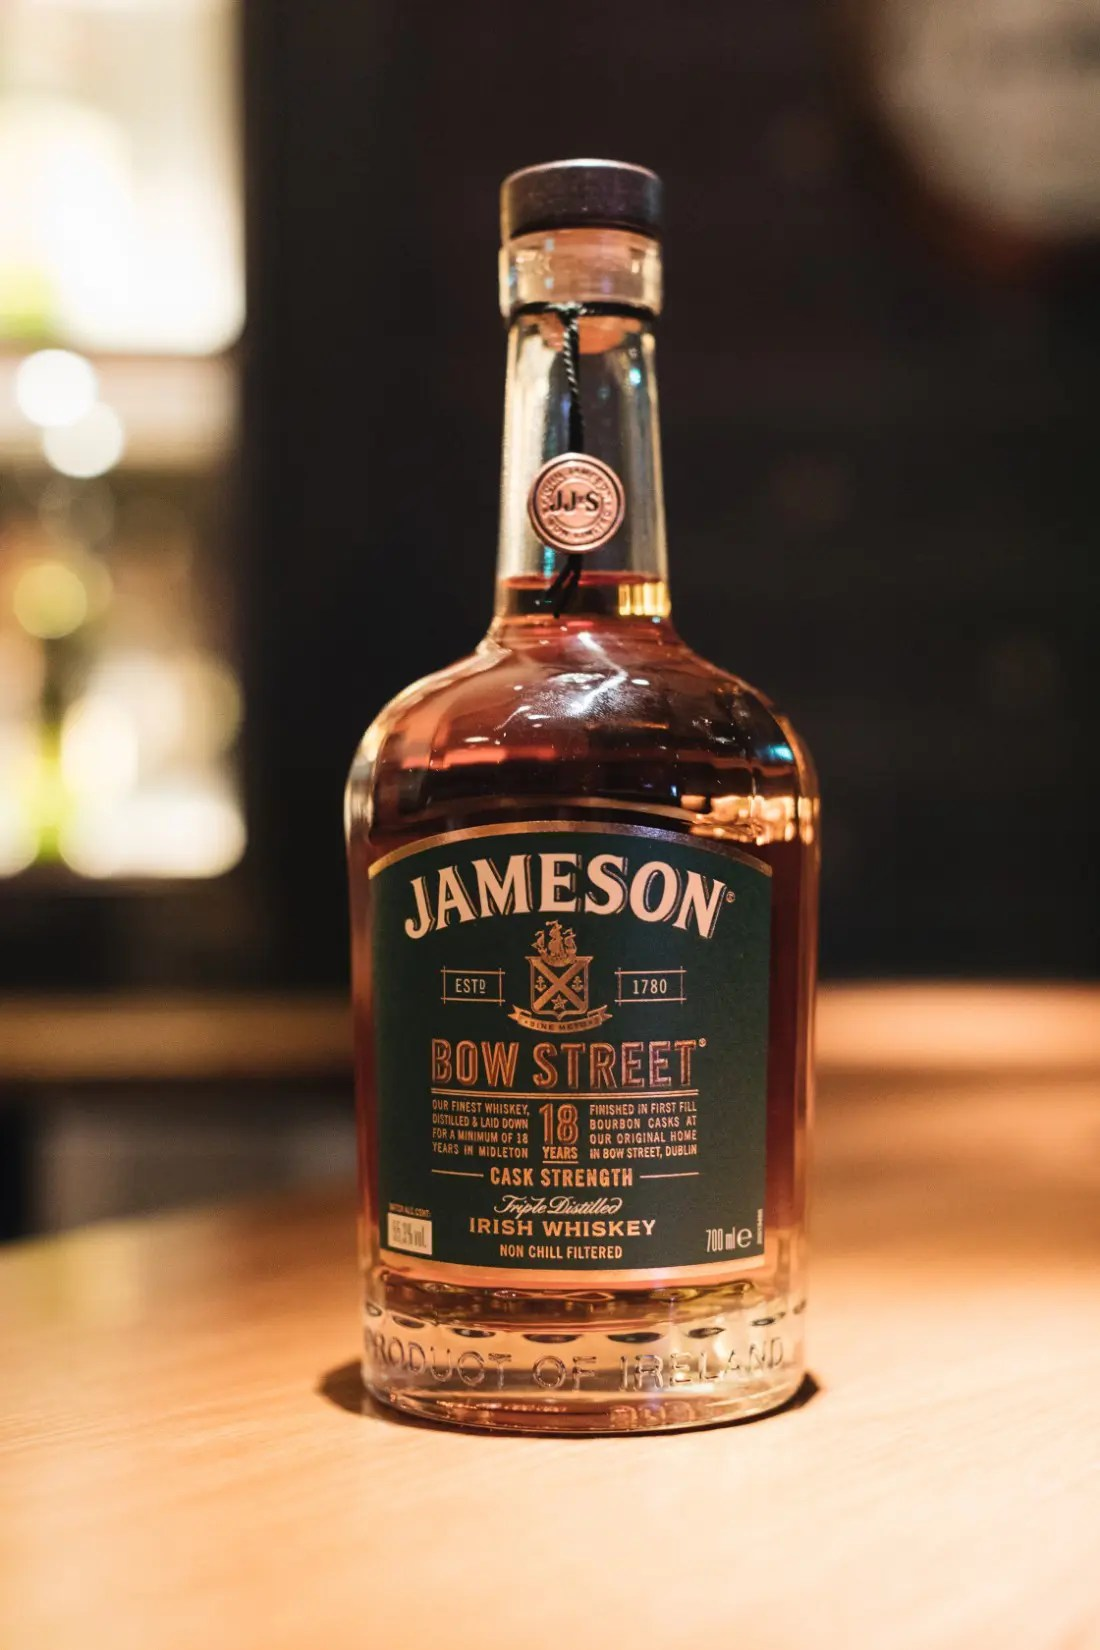 Jameson Bow Street 18 Years Cask Strength Whisky